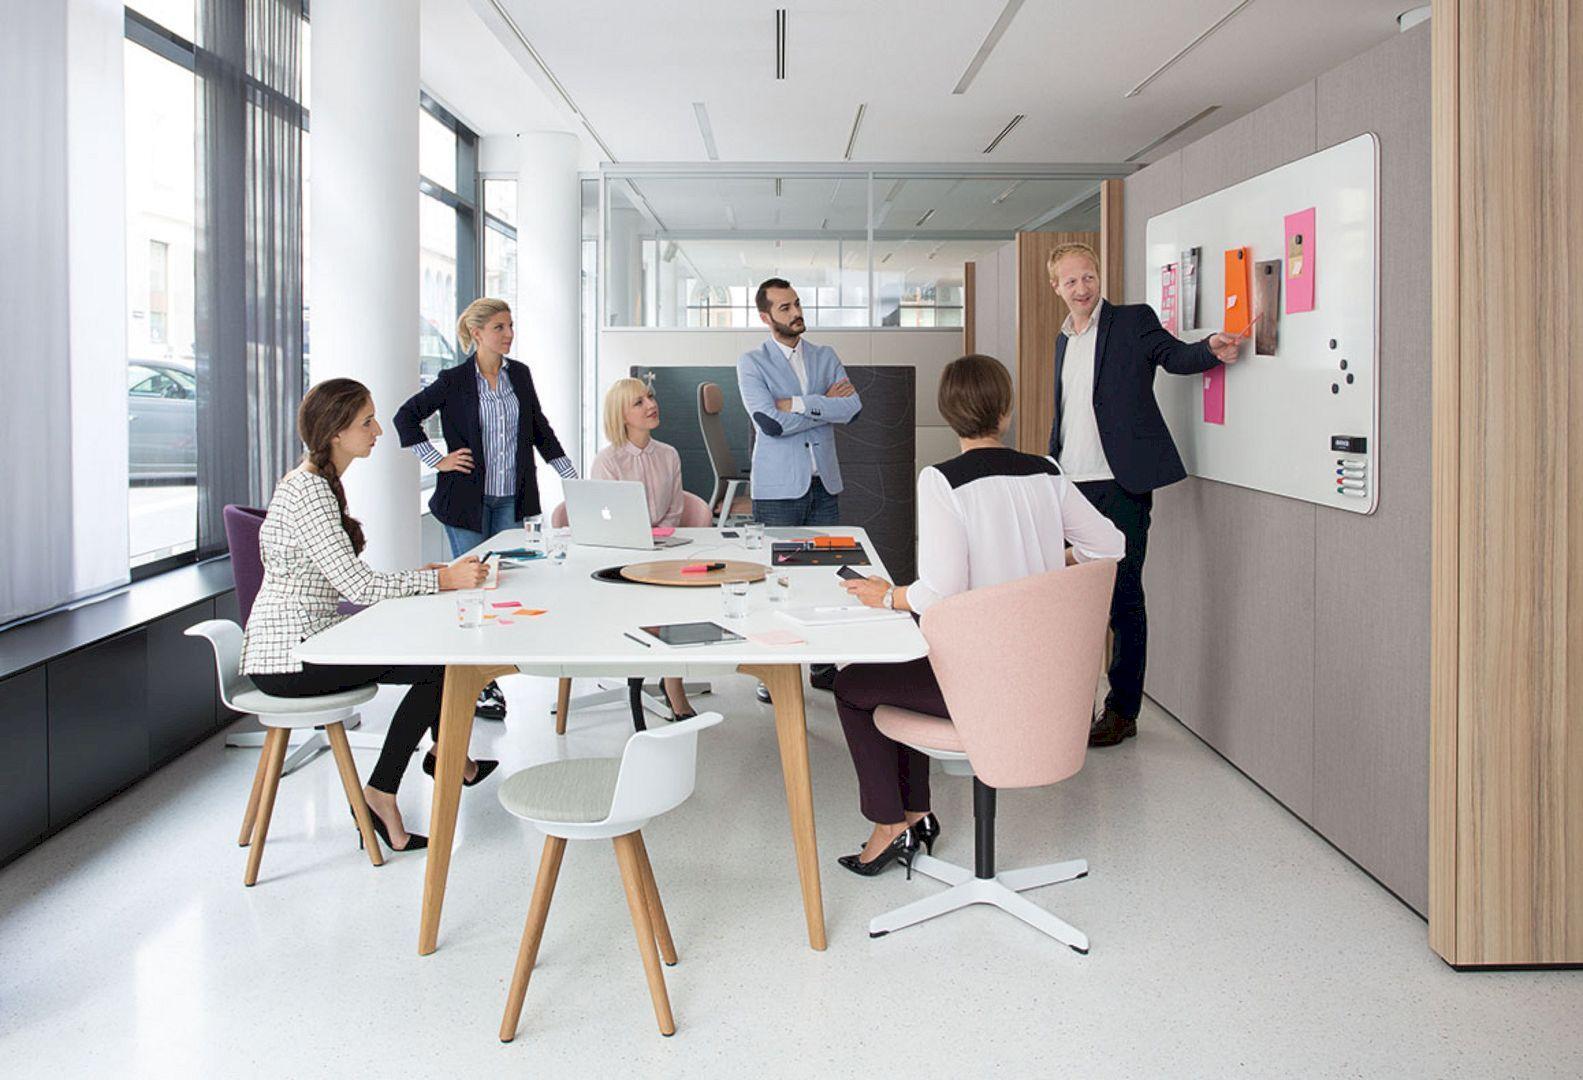 Jardine House An Innovative Workspace Refurbished By Bean Buro Office Interior Design Furniture Office Furniture